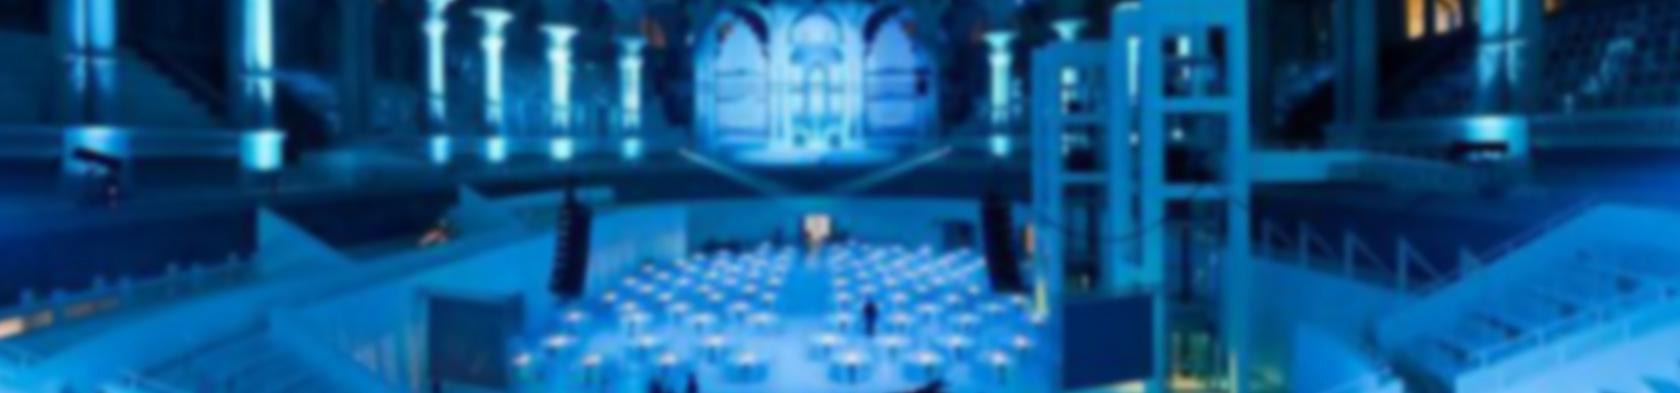 event-planning